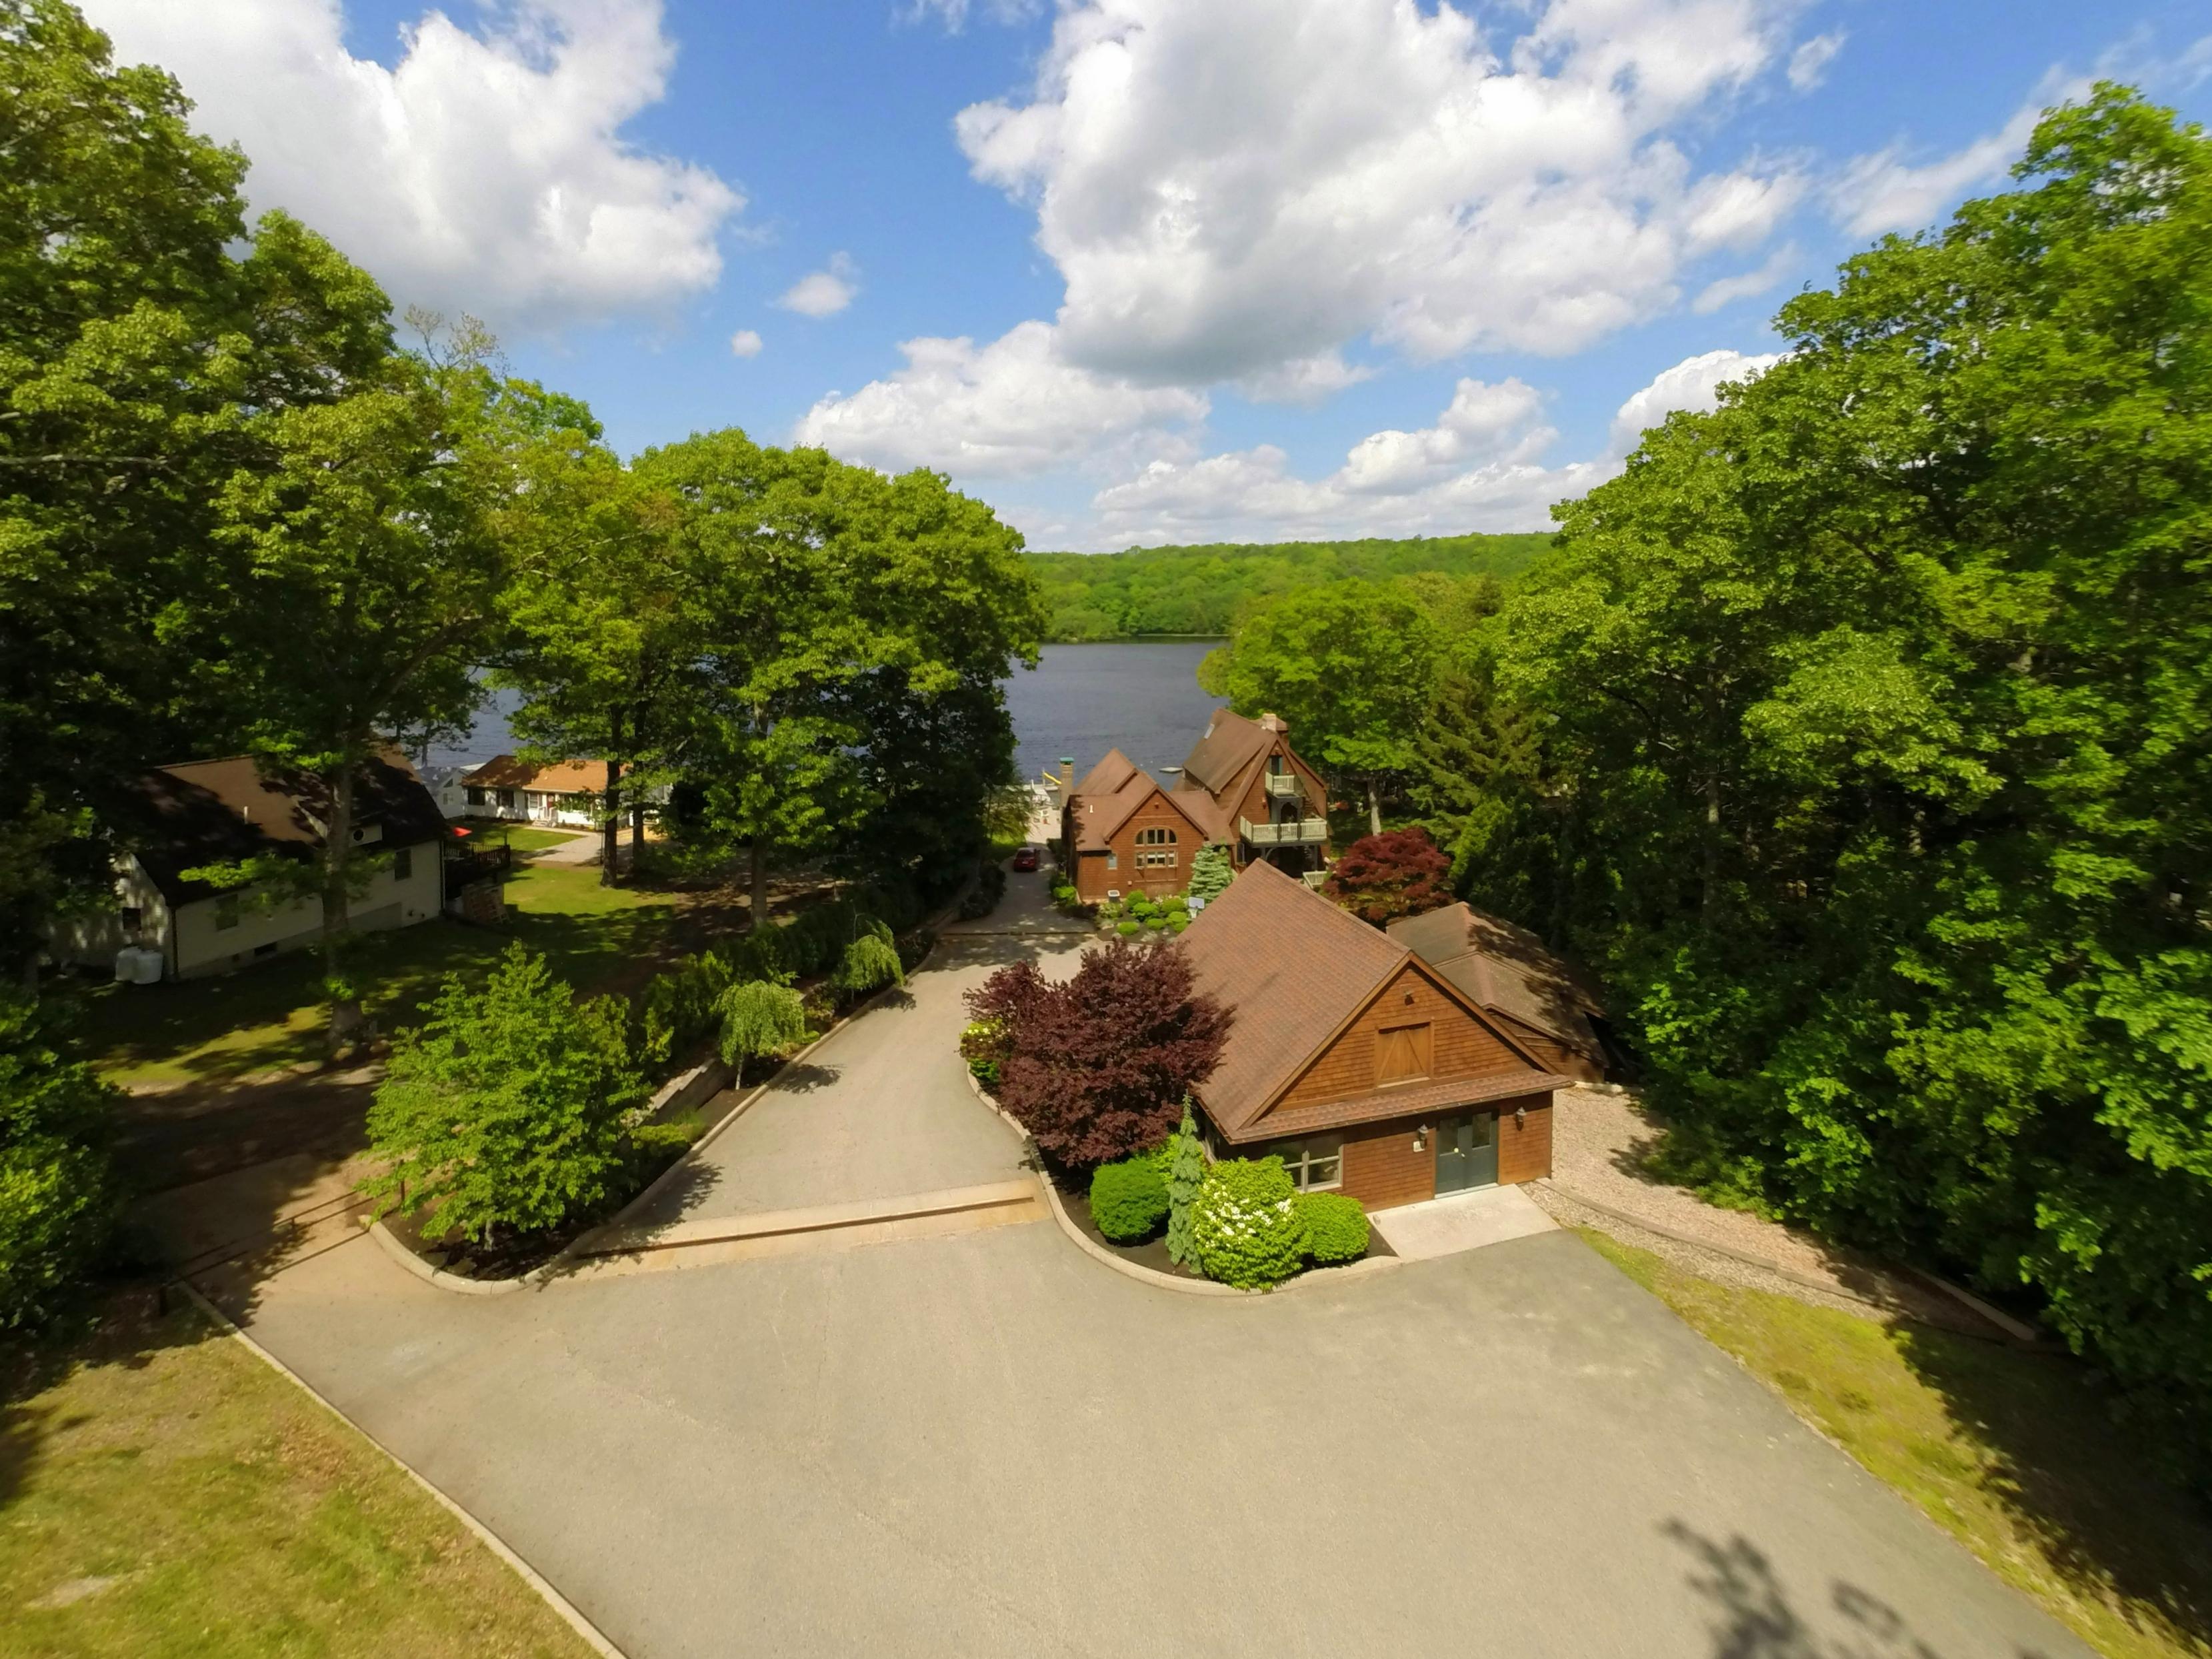 独户住宅 为 销售 在 The Lake House 1439 Old Colchester Rd Montville, 康涅狄格州 06370 美国